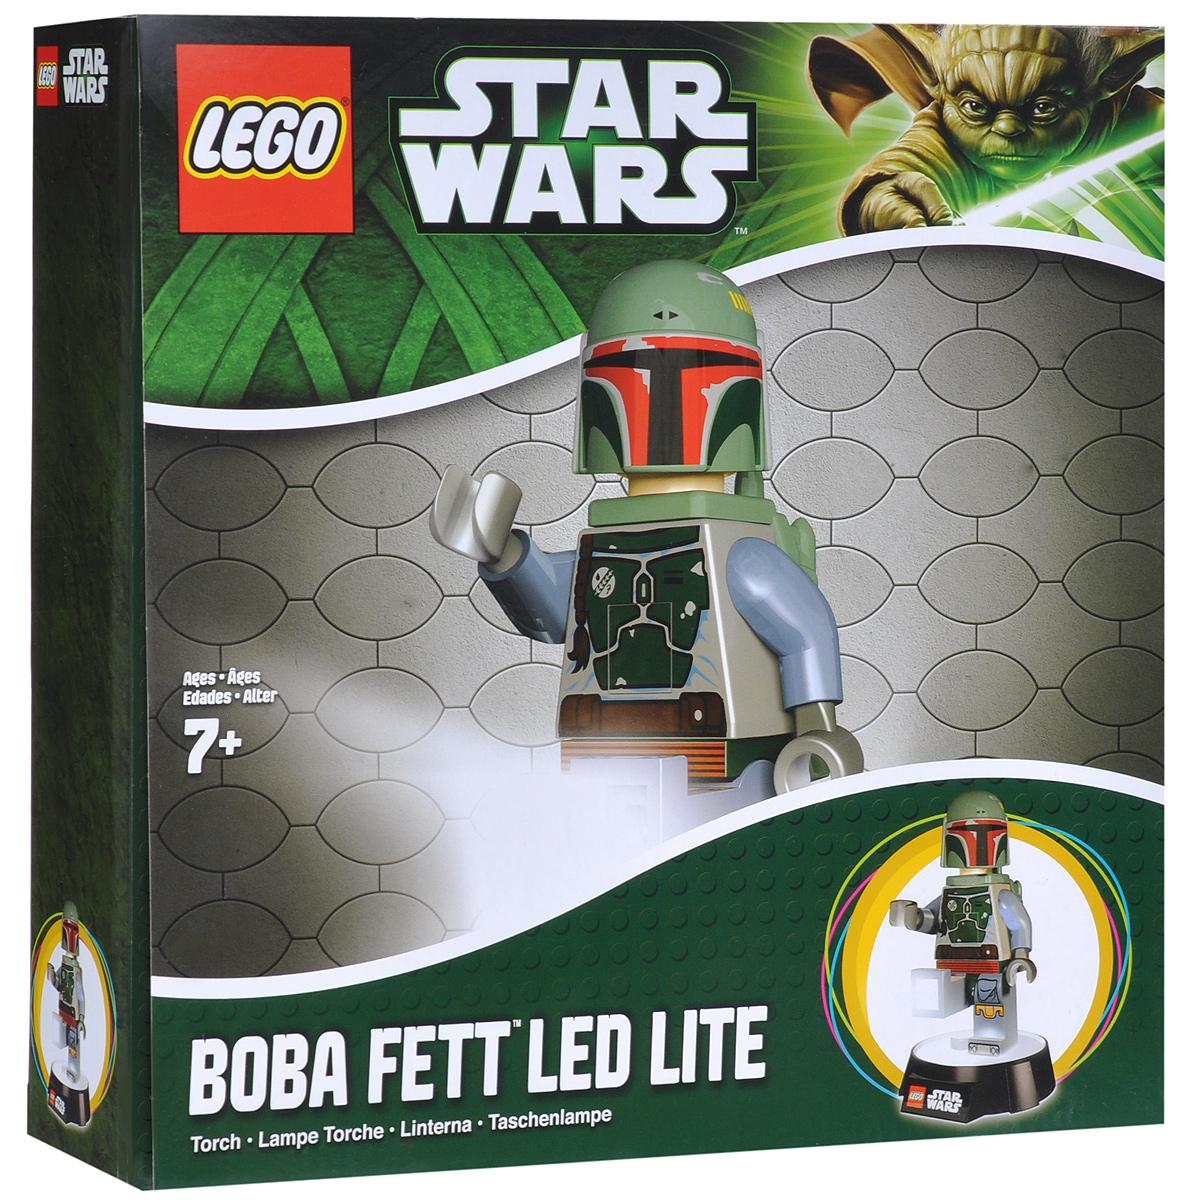 LEGO: Фонарик-ночник Star Wars: Boba Fett LGL-TOB8